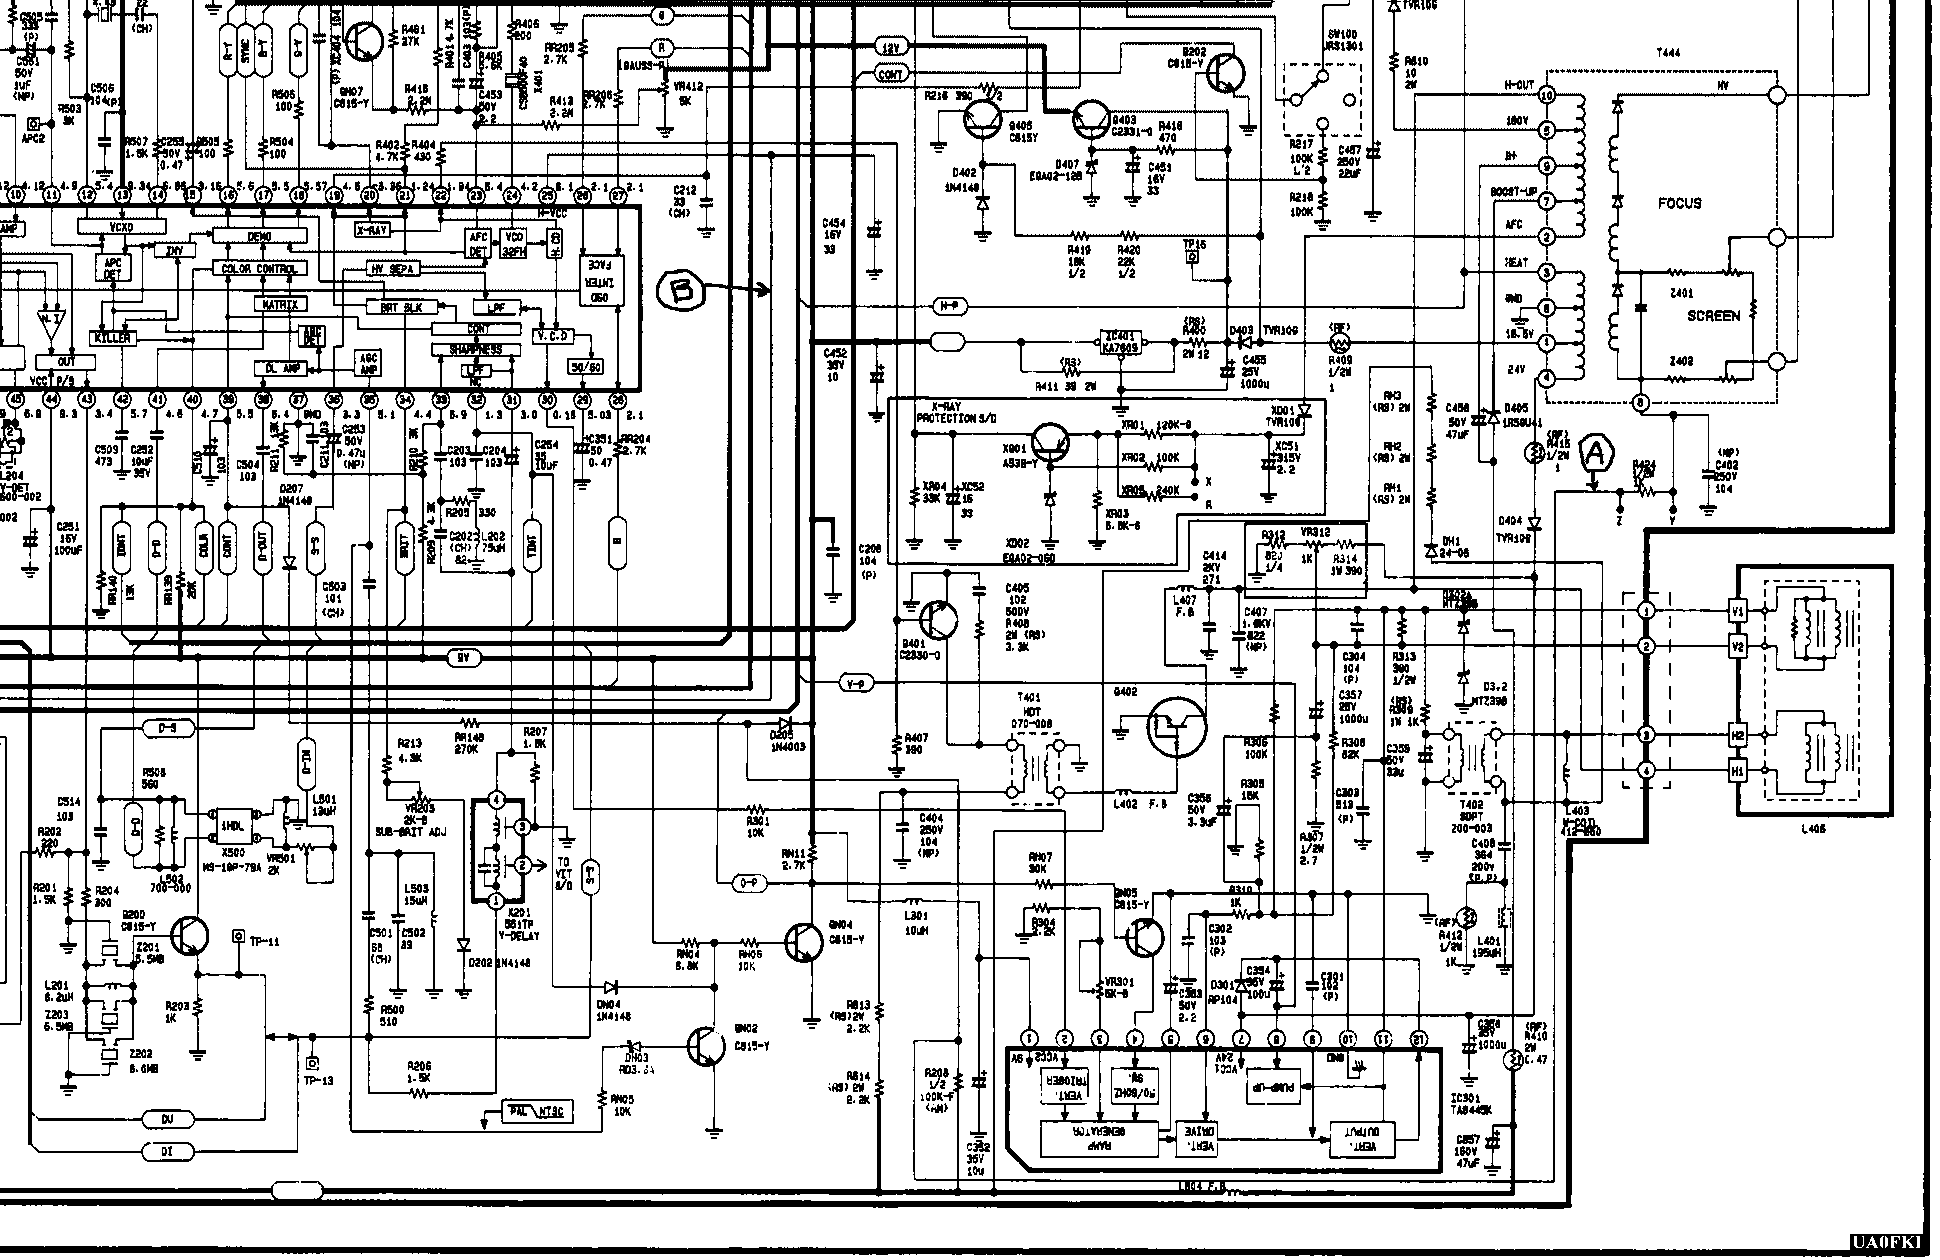 Samsung ck-5083zr схемы